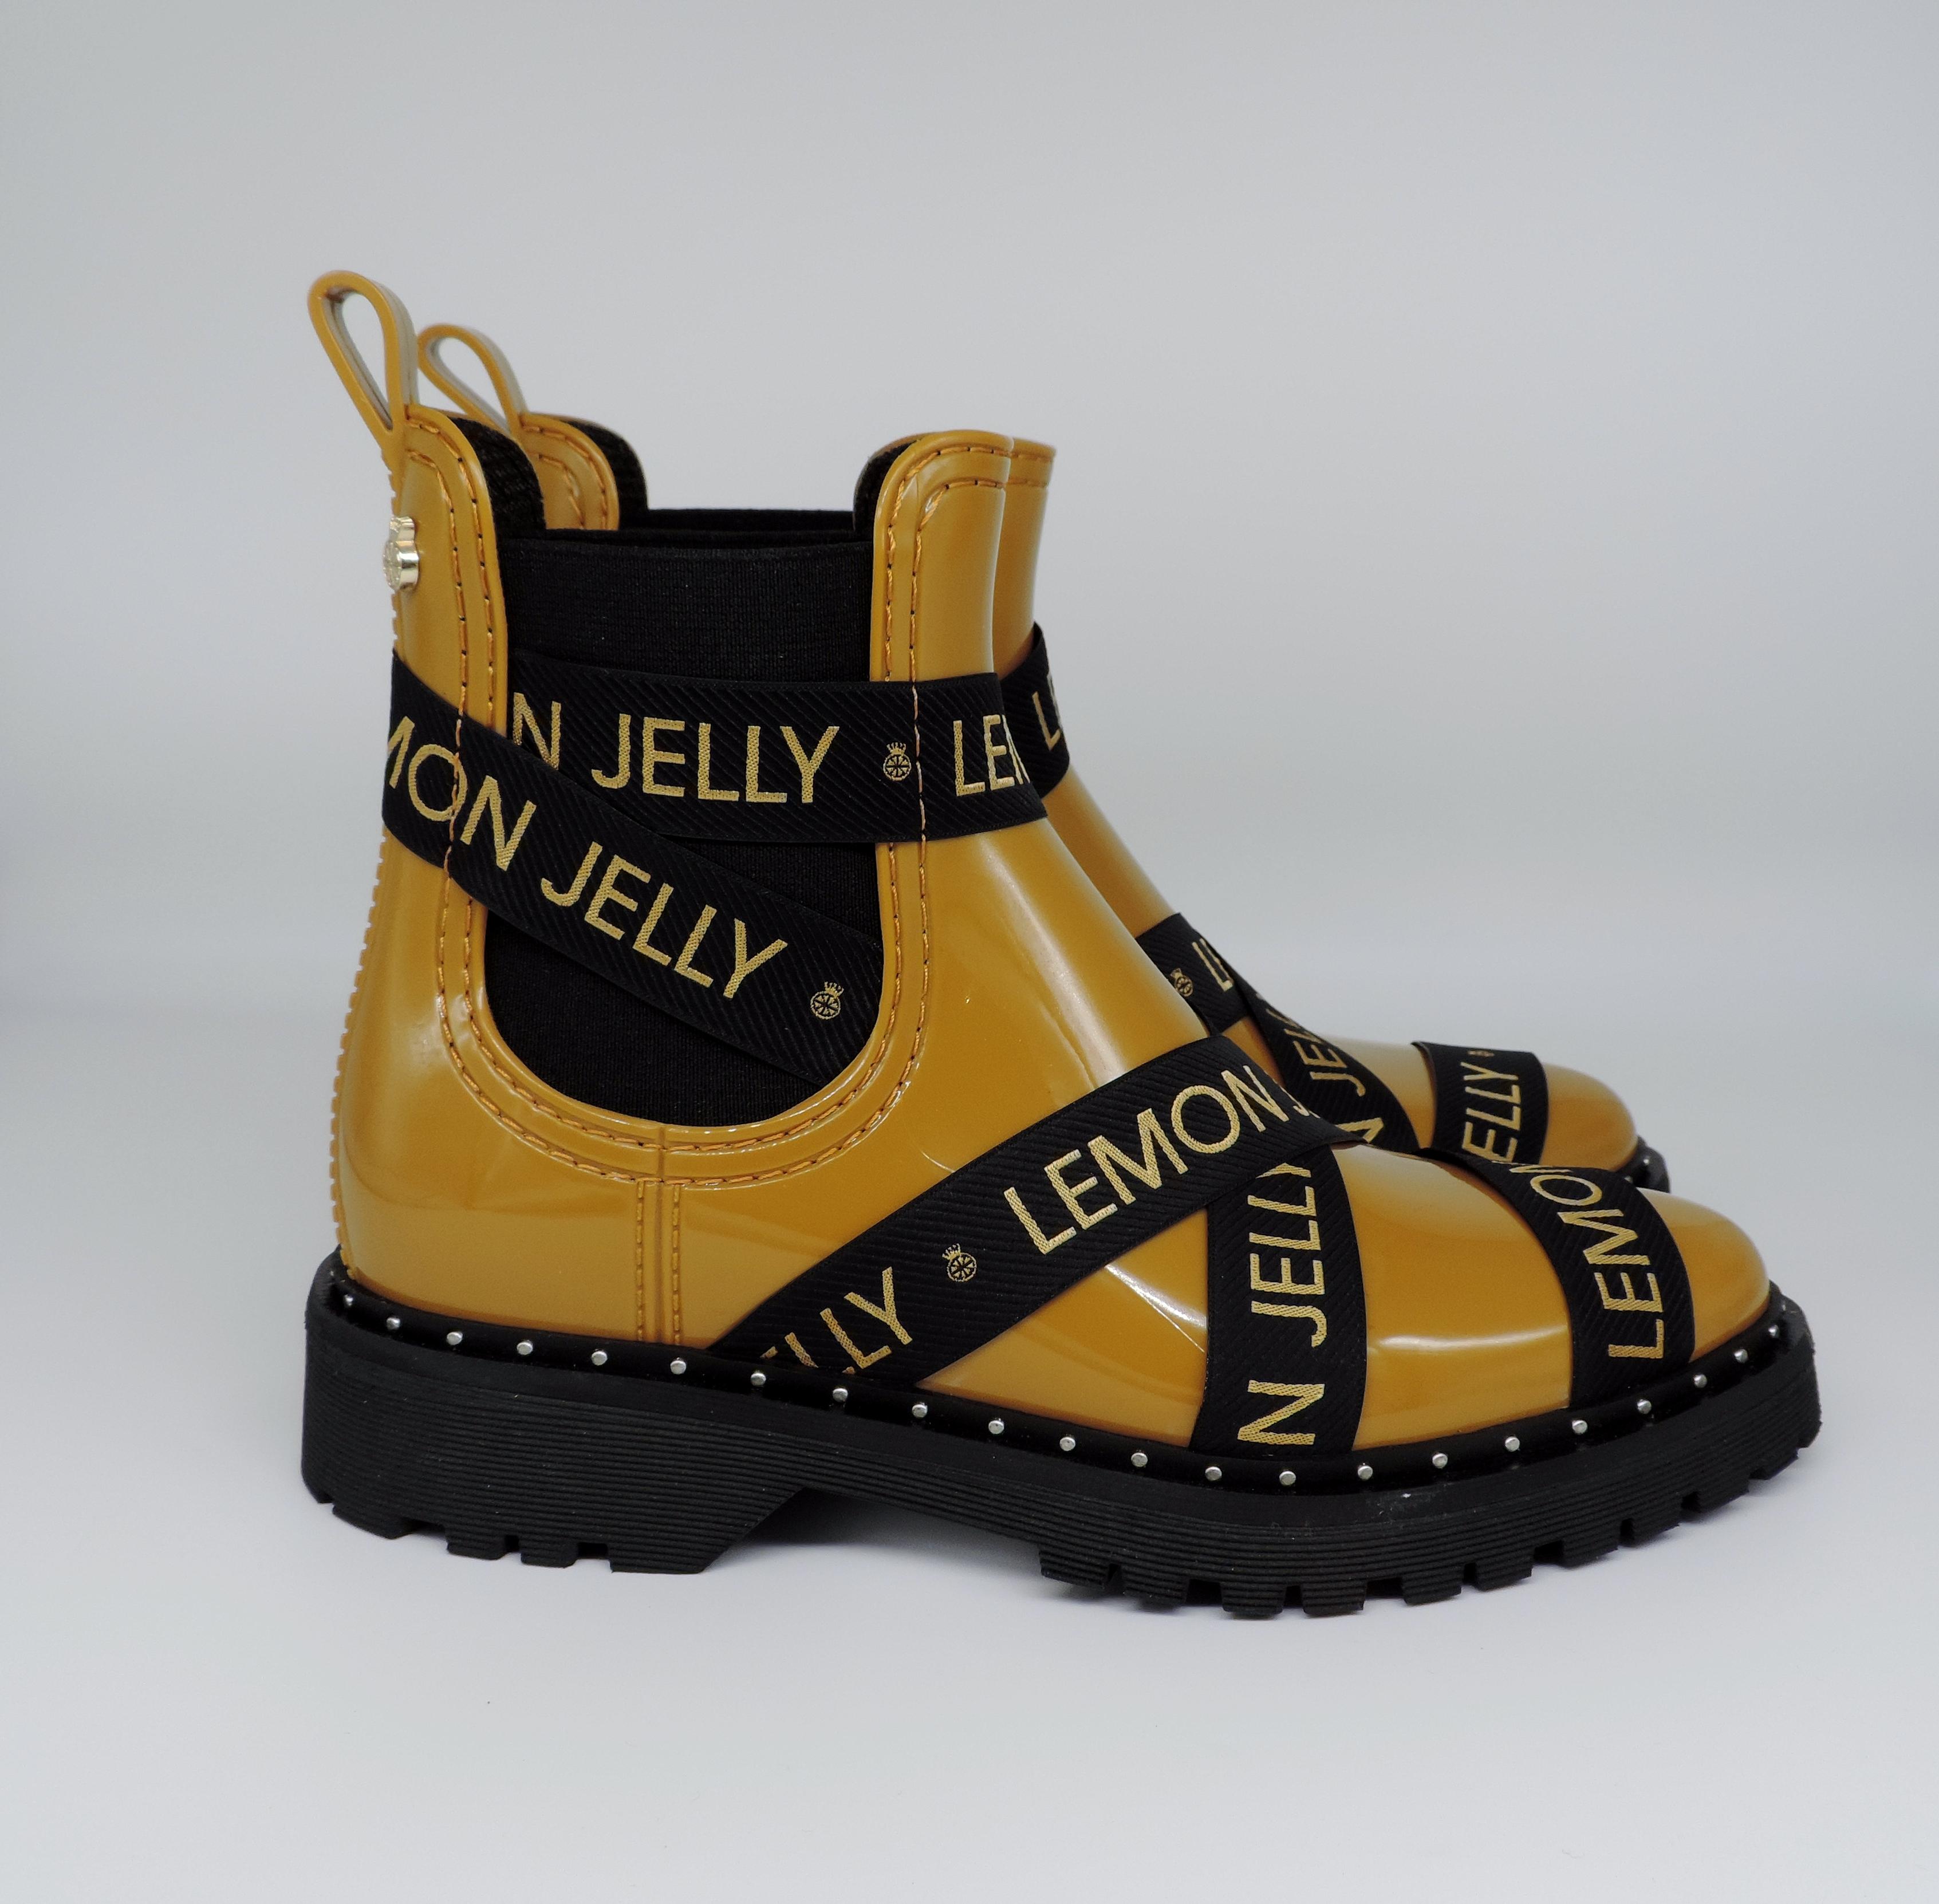 Lemon Jelly Gummistiefel